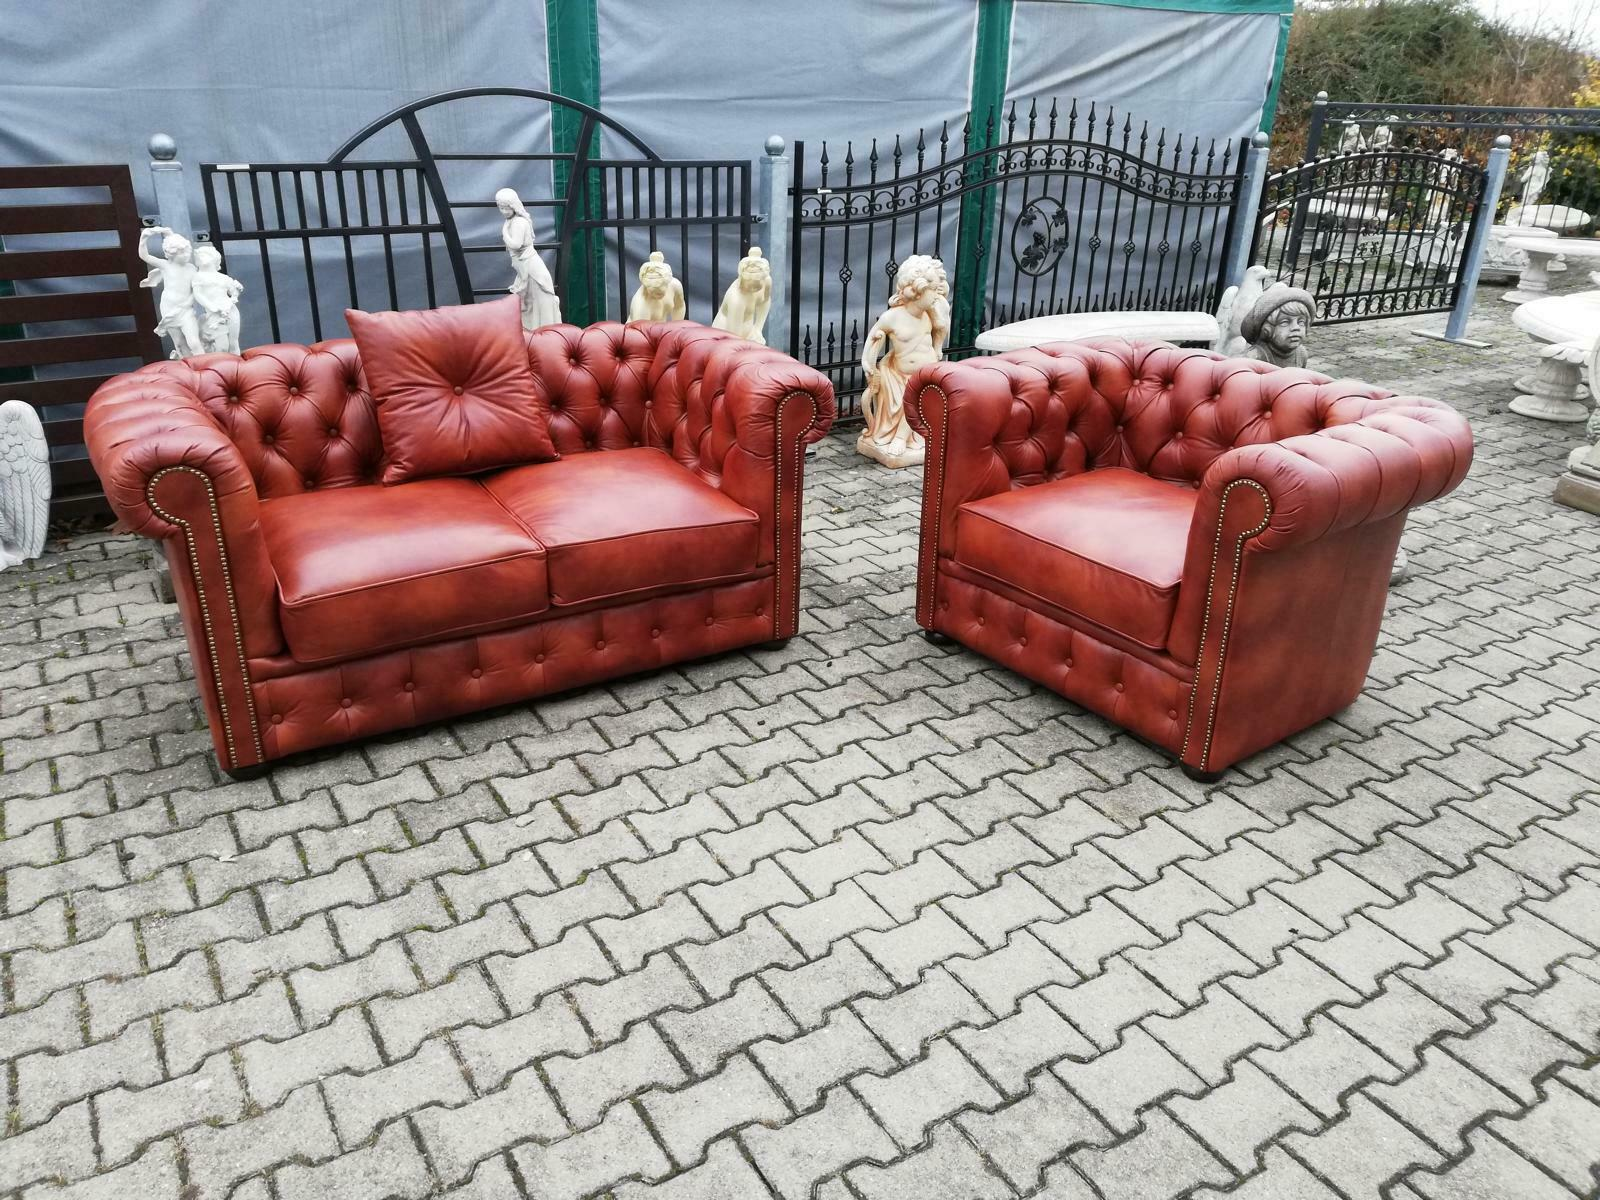 Chesterfield Sofagarnitur Sofa Couch Polster Garnitur 3+1 Sitz 100% Leder SOFORT